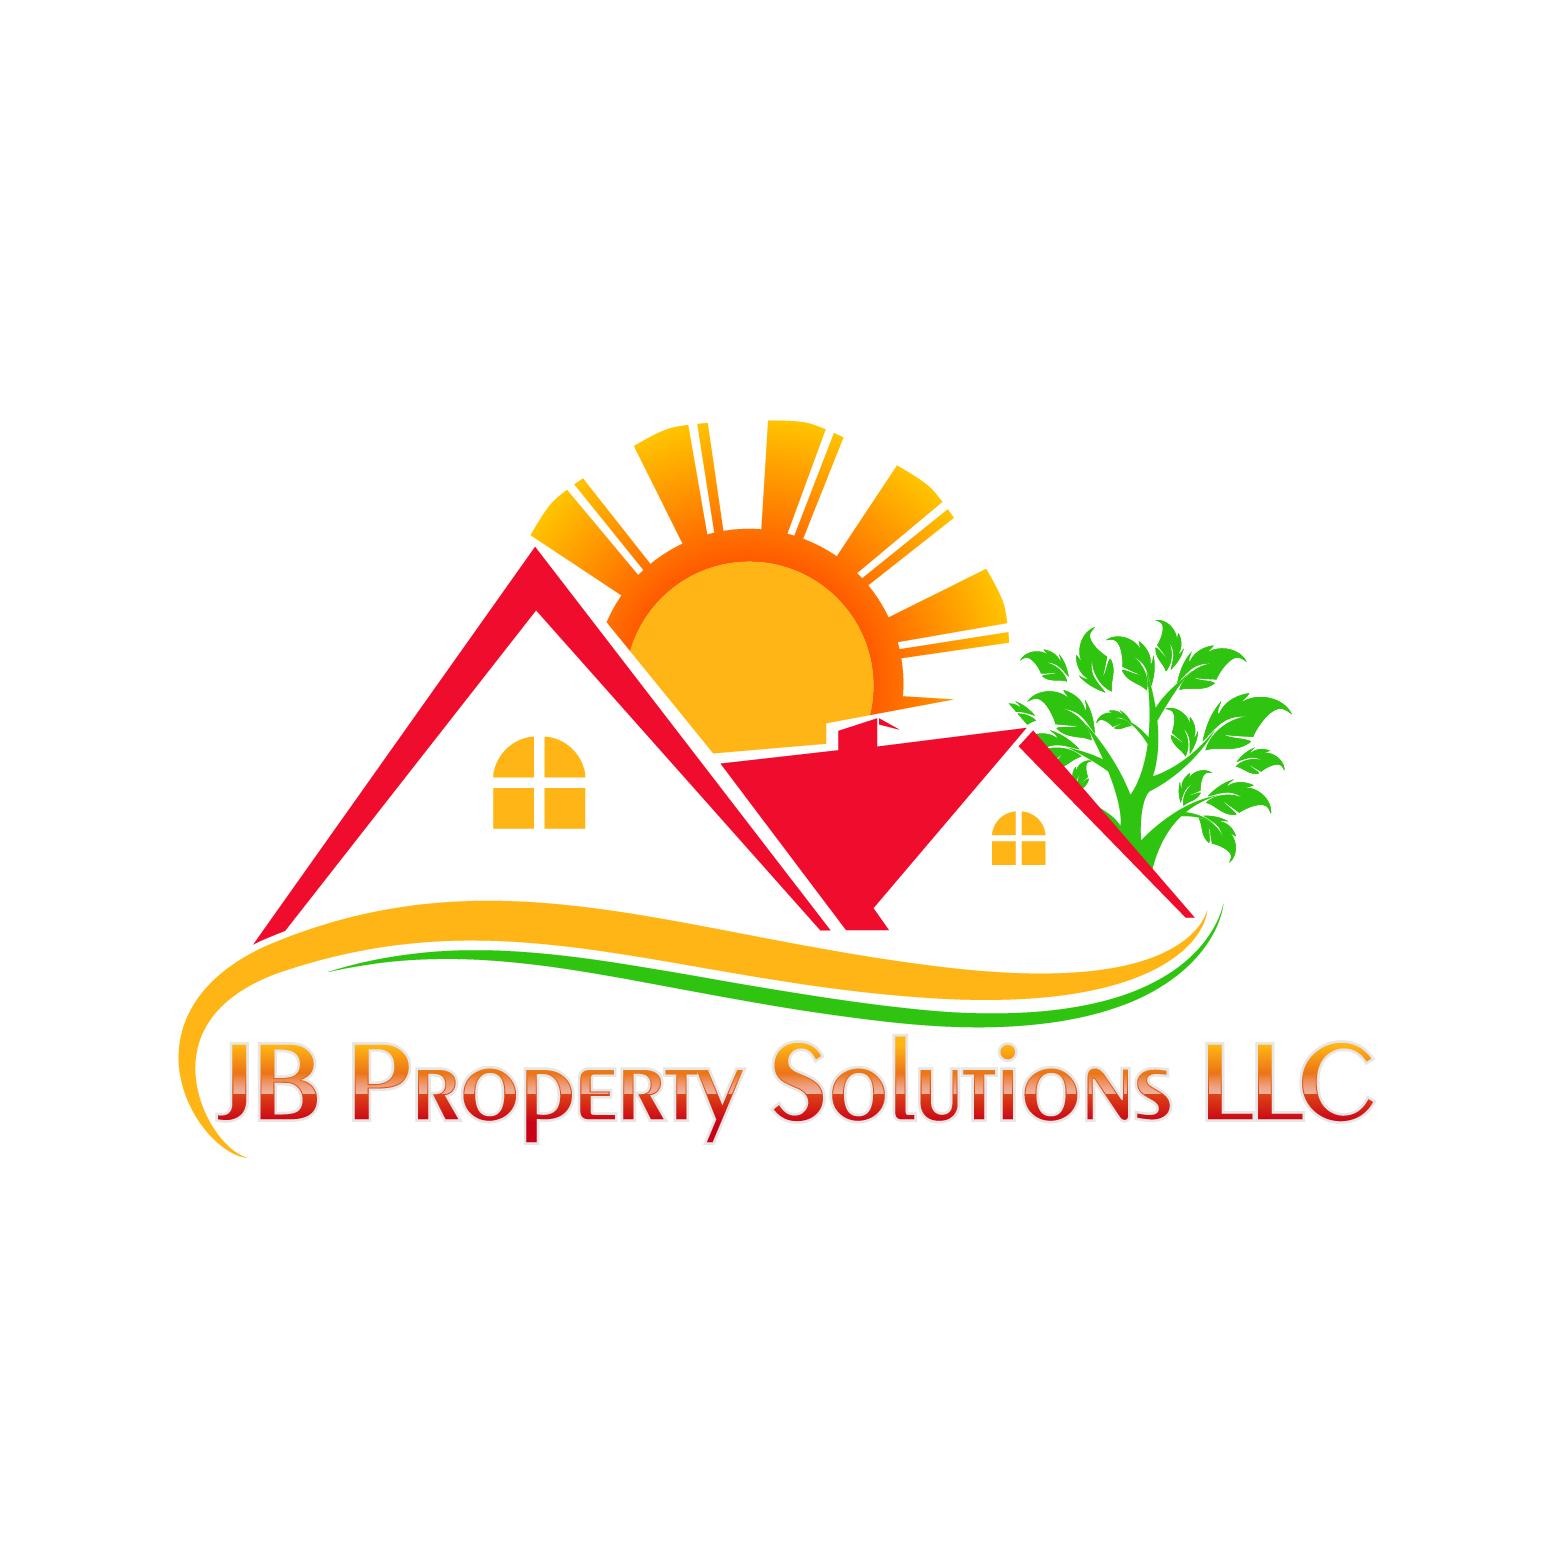 Chesapeake Home Warranty Plans Find Home Warranty Plans